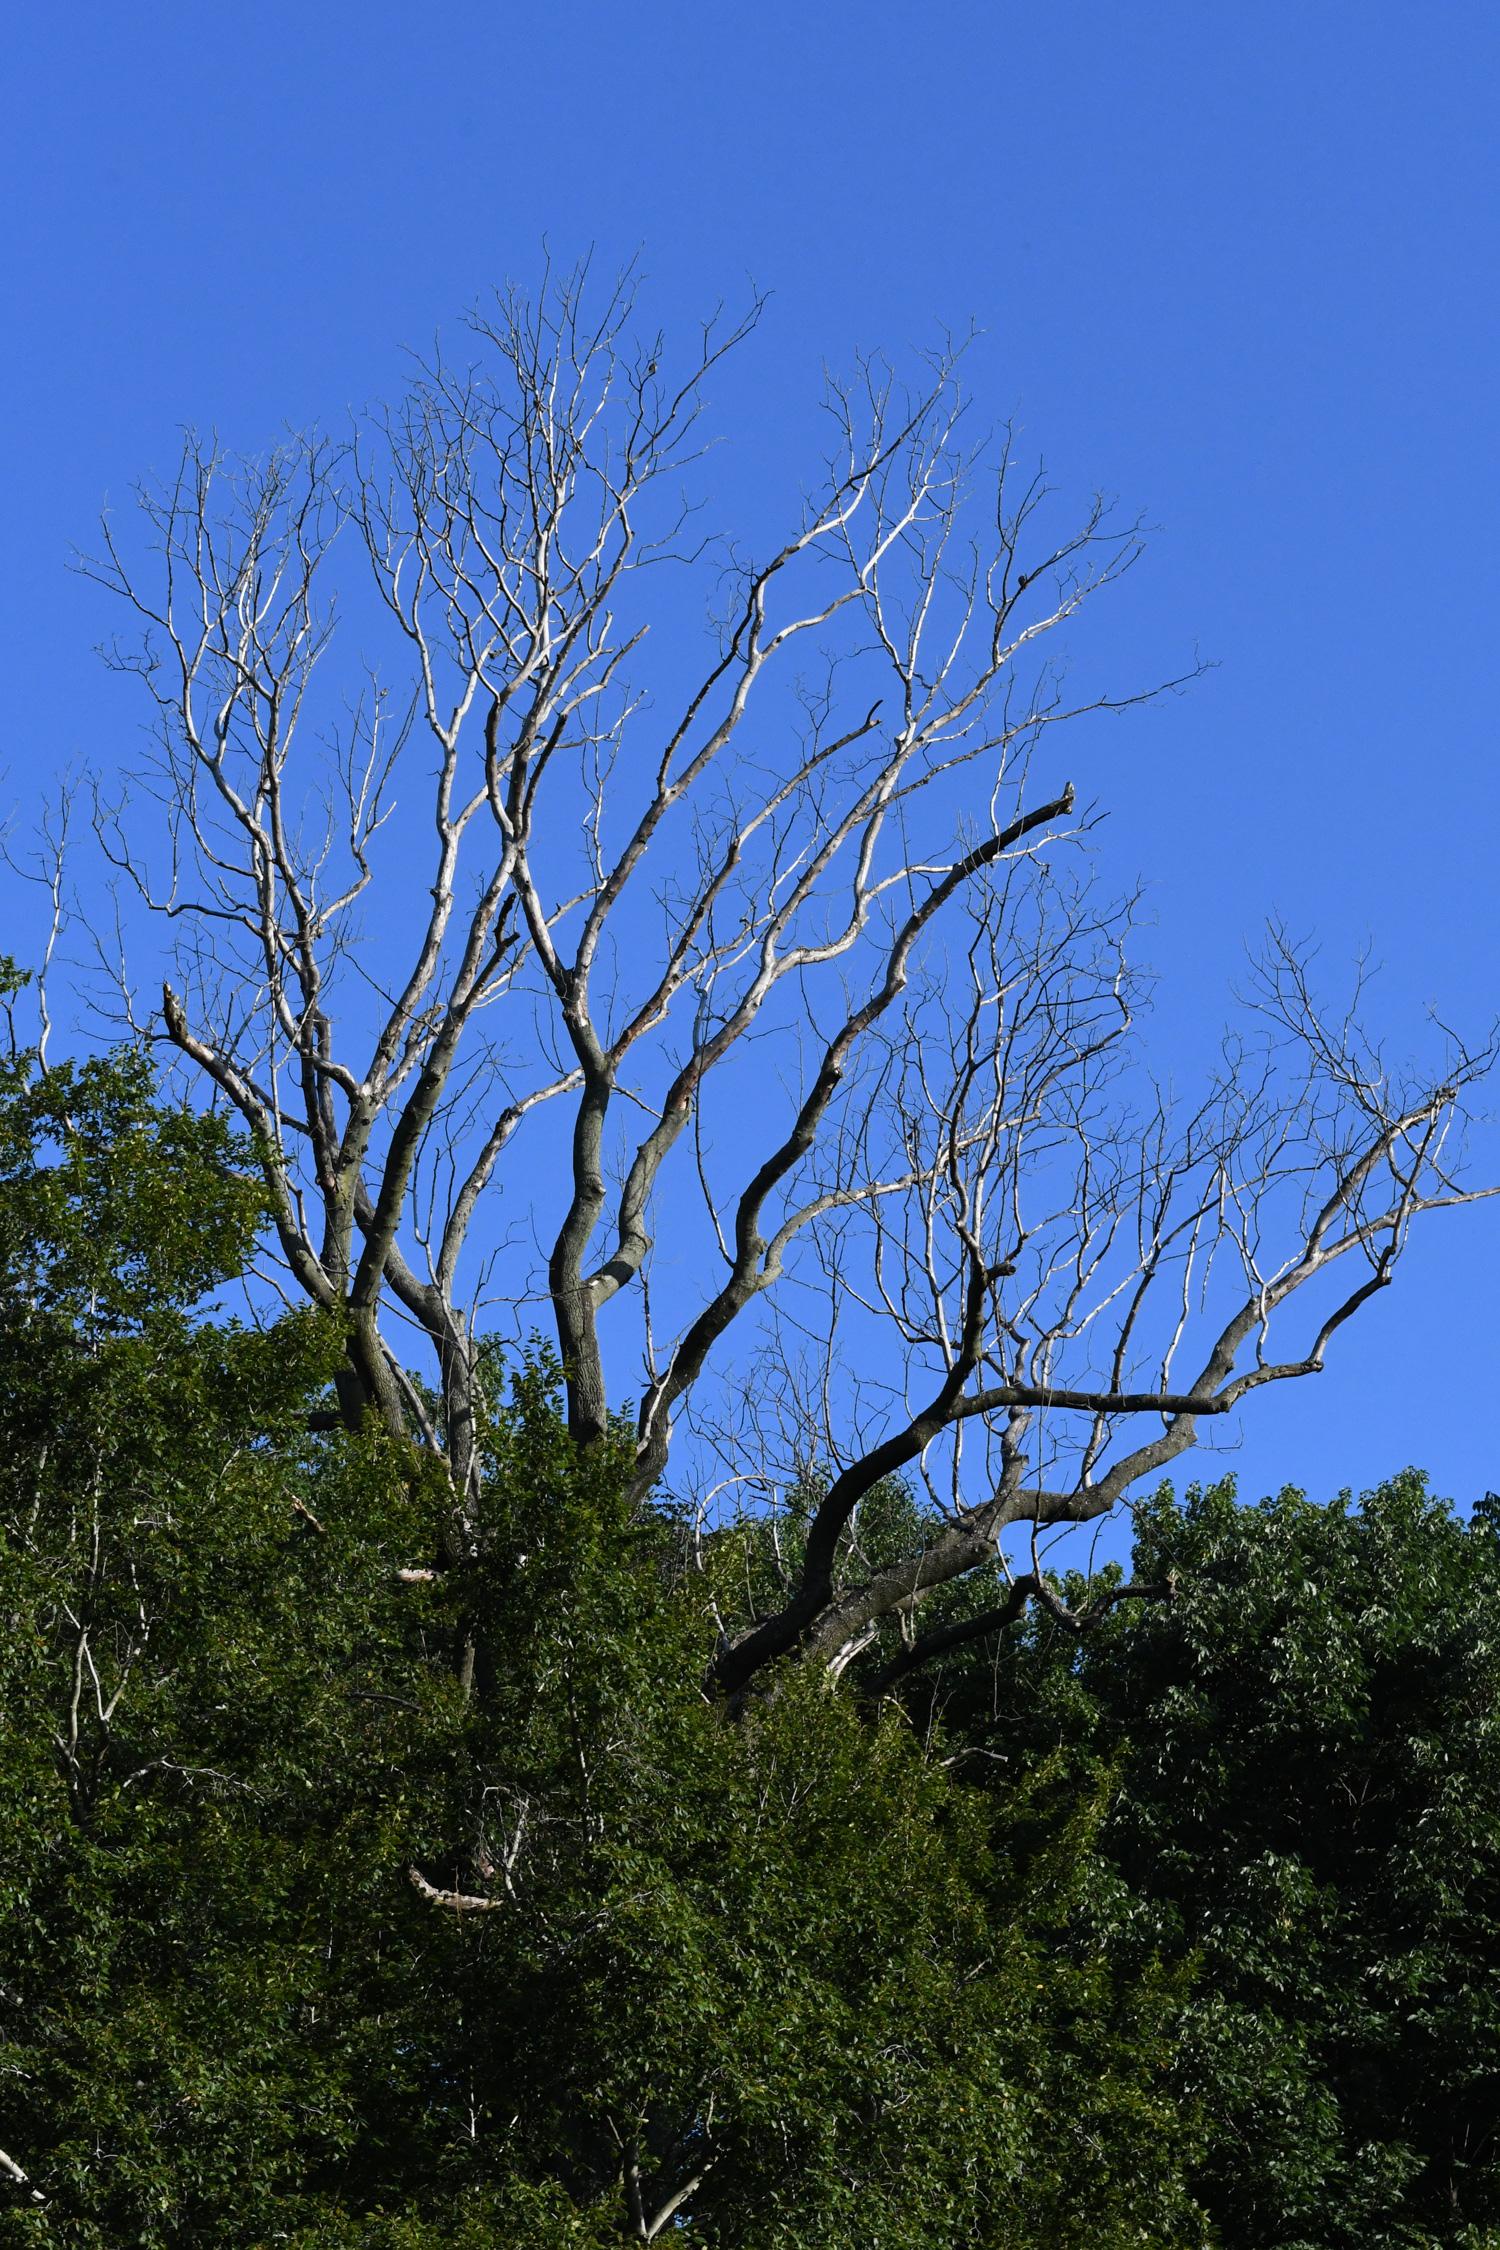 Dead tree against sky, Prospect Park